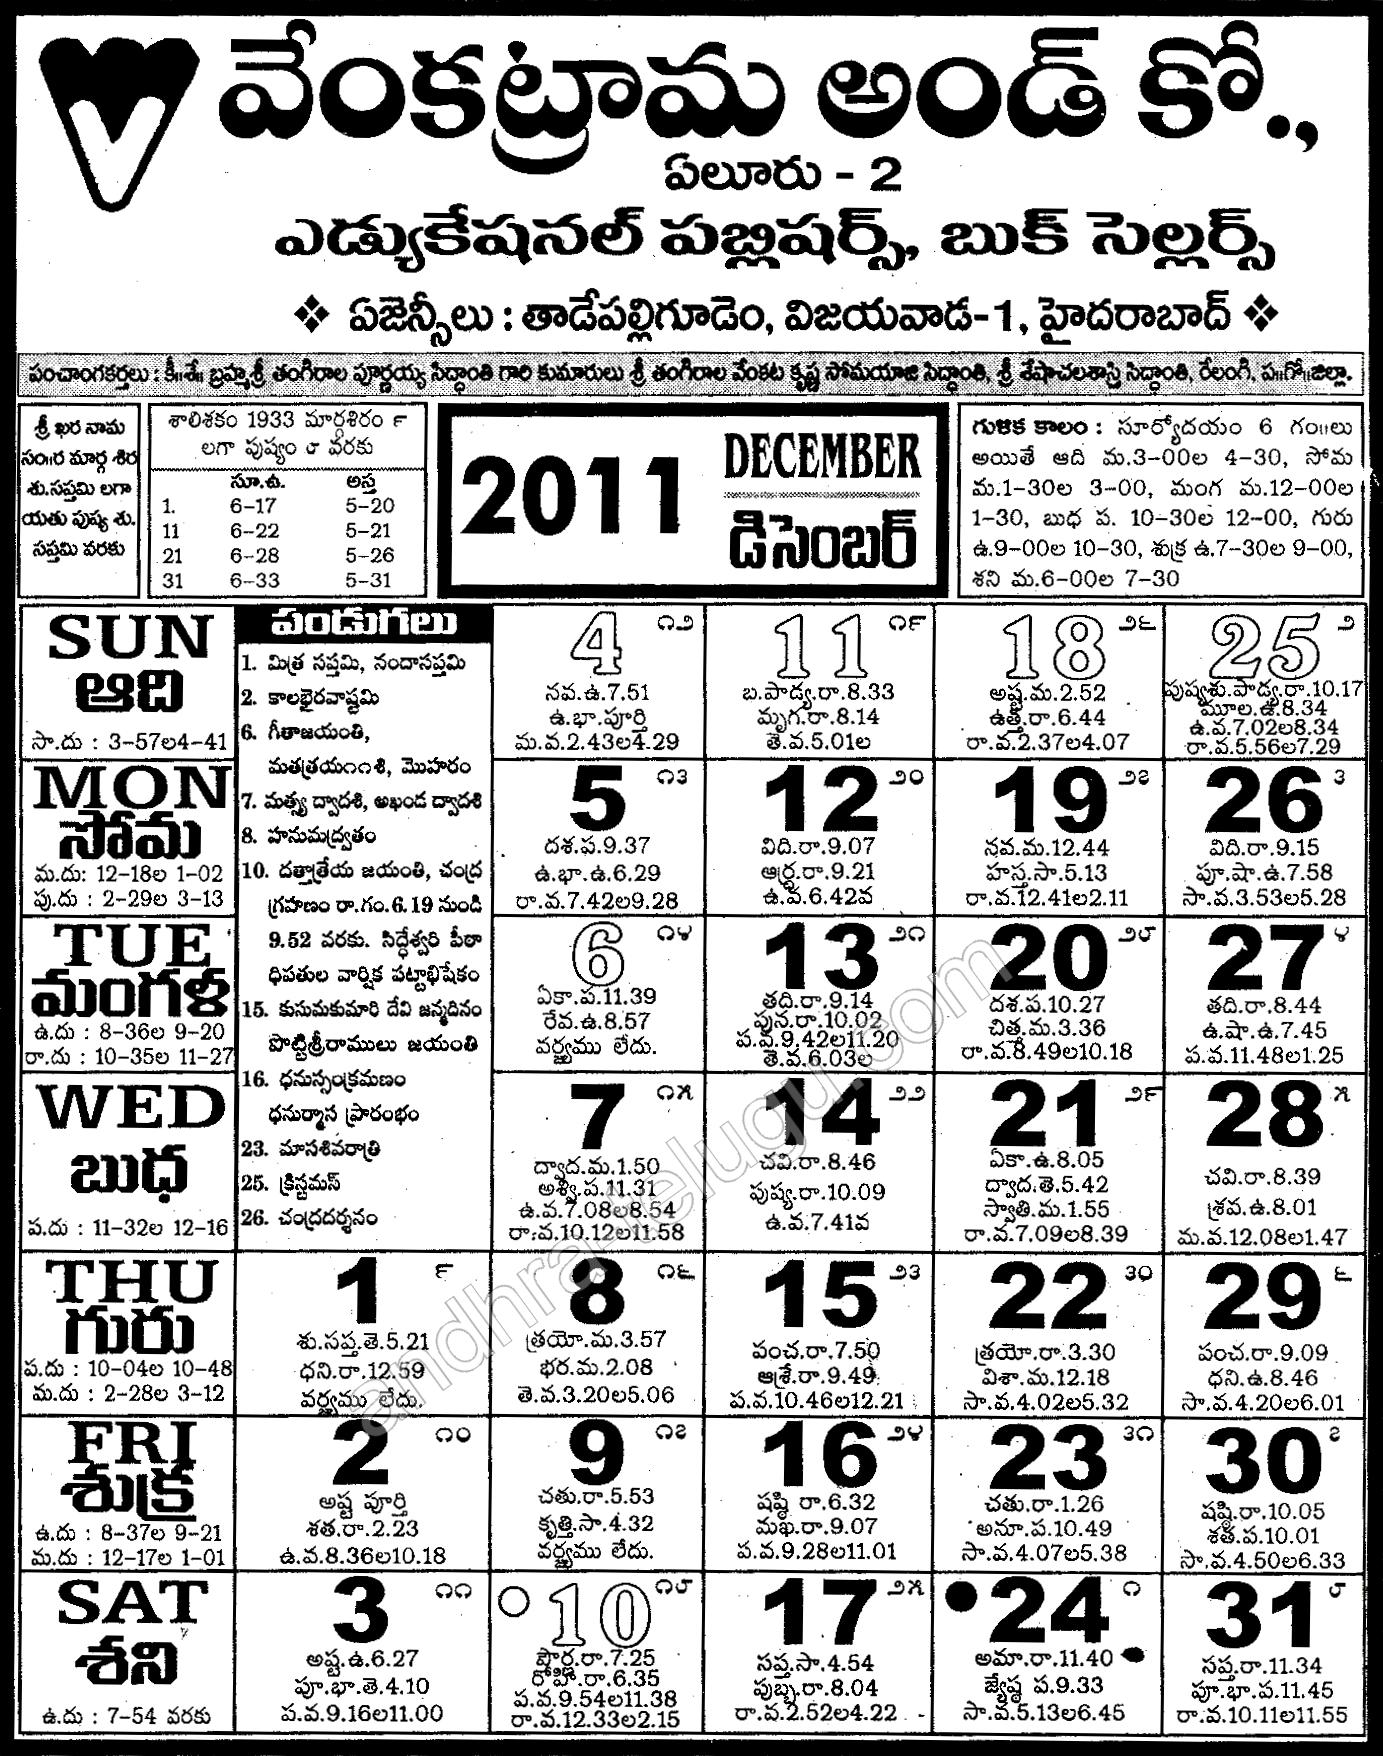 2016 Calendar Venkatrama Junuary | Calendar Template 2016